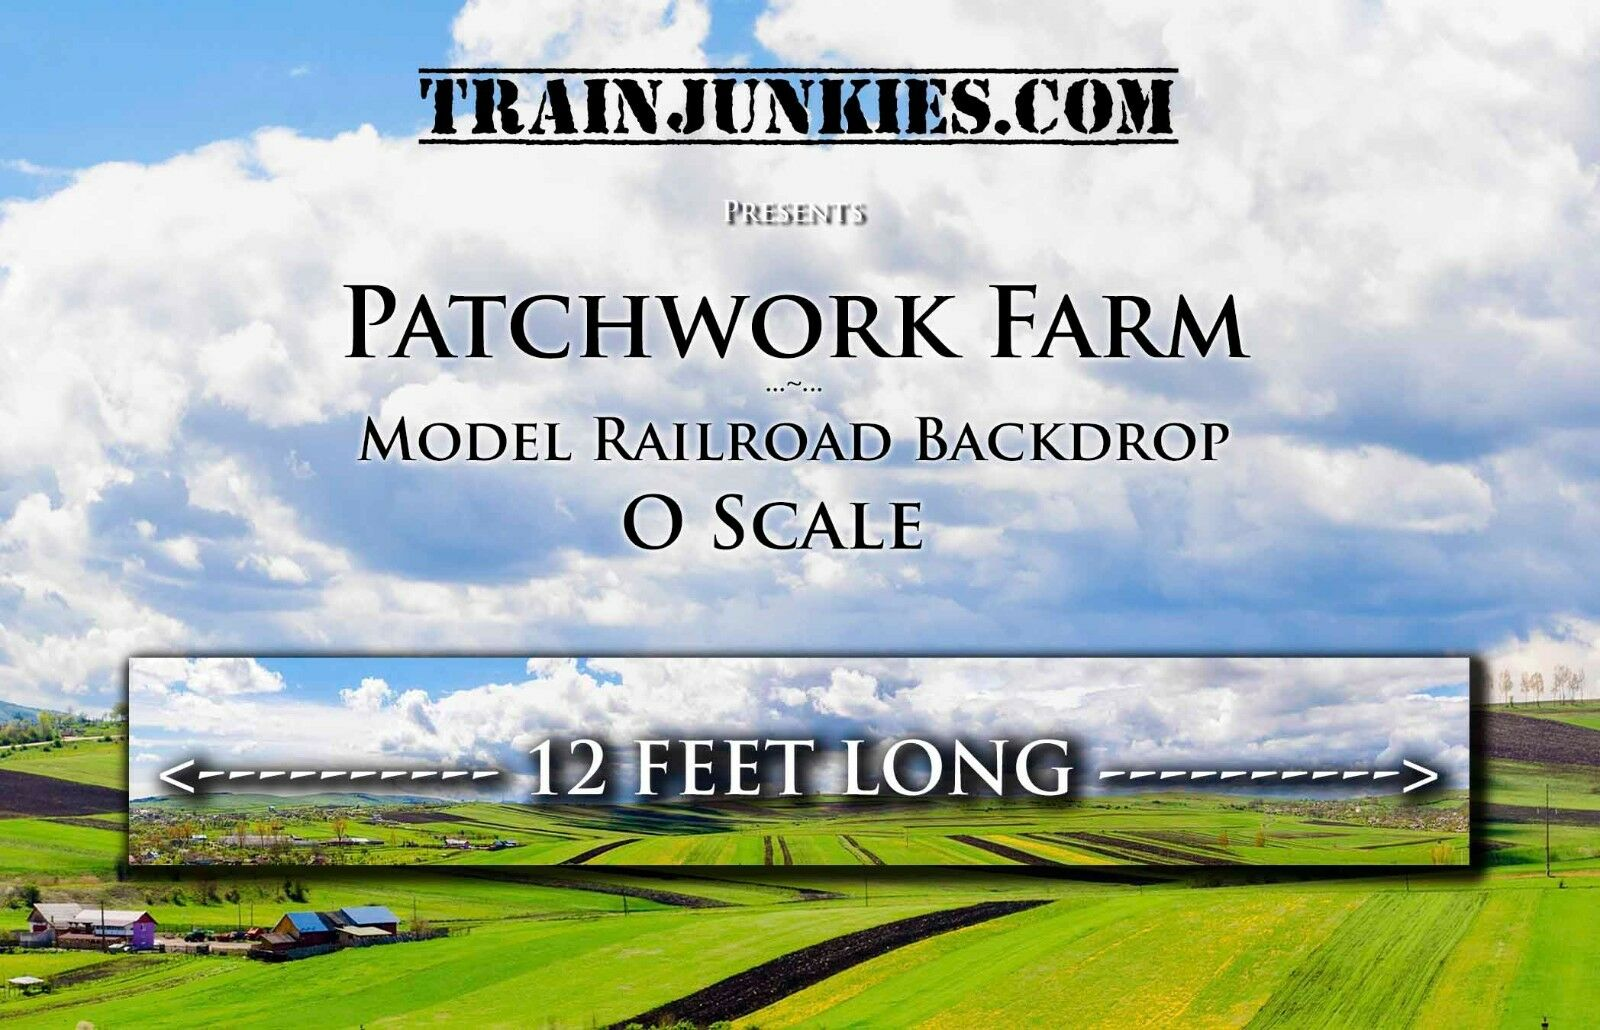 Train Junkies O Scale  Patchwork Landwirtschafts  Modelll Railroad Backdrop 24x144